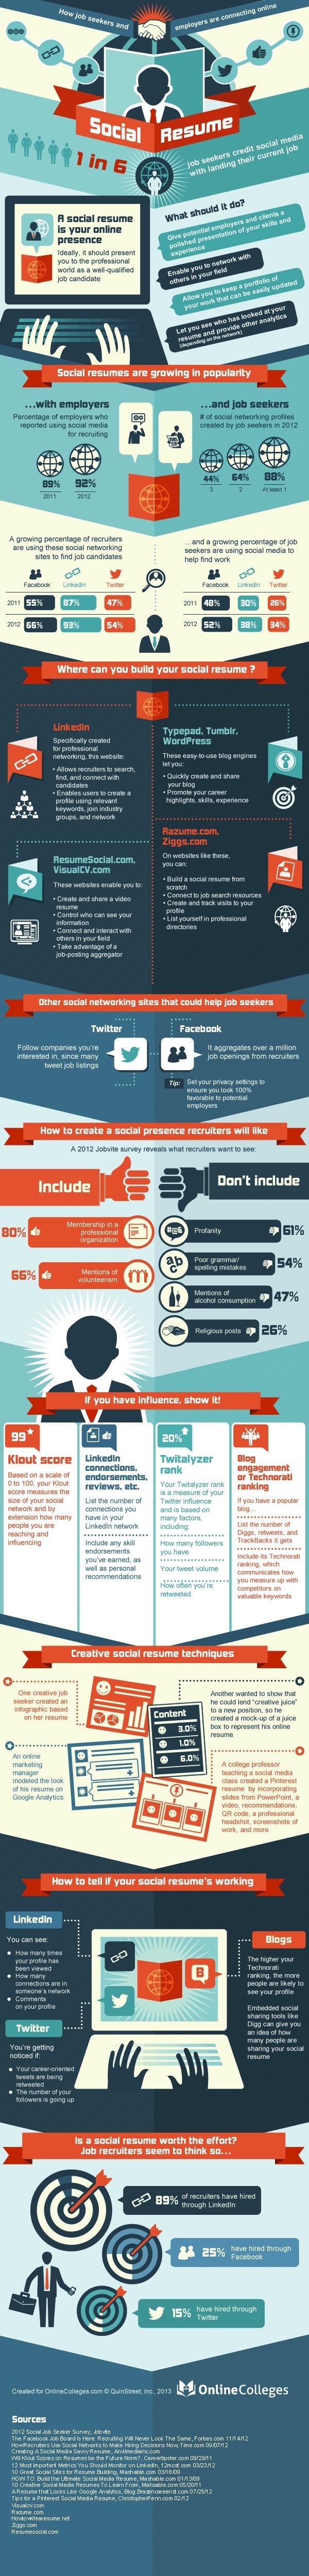 Si buscas trabajo necesitas tu Curriculum Social